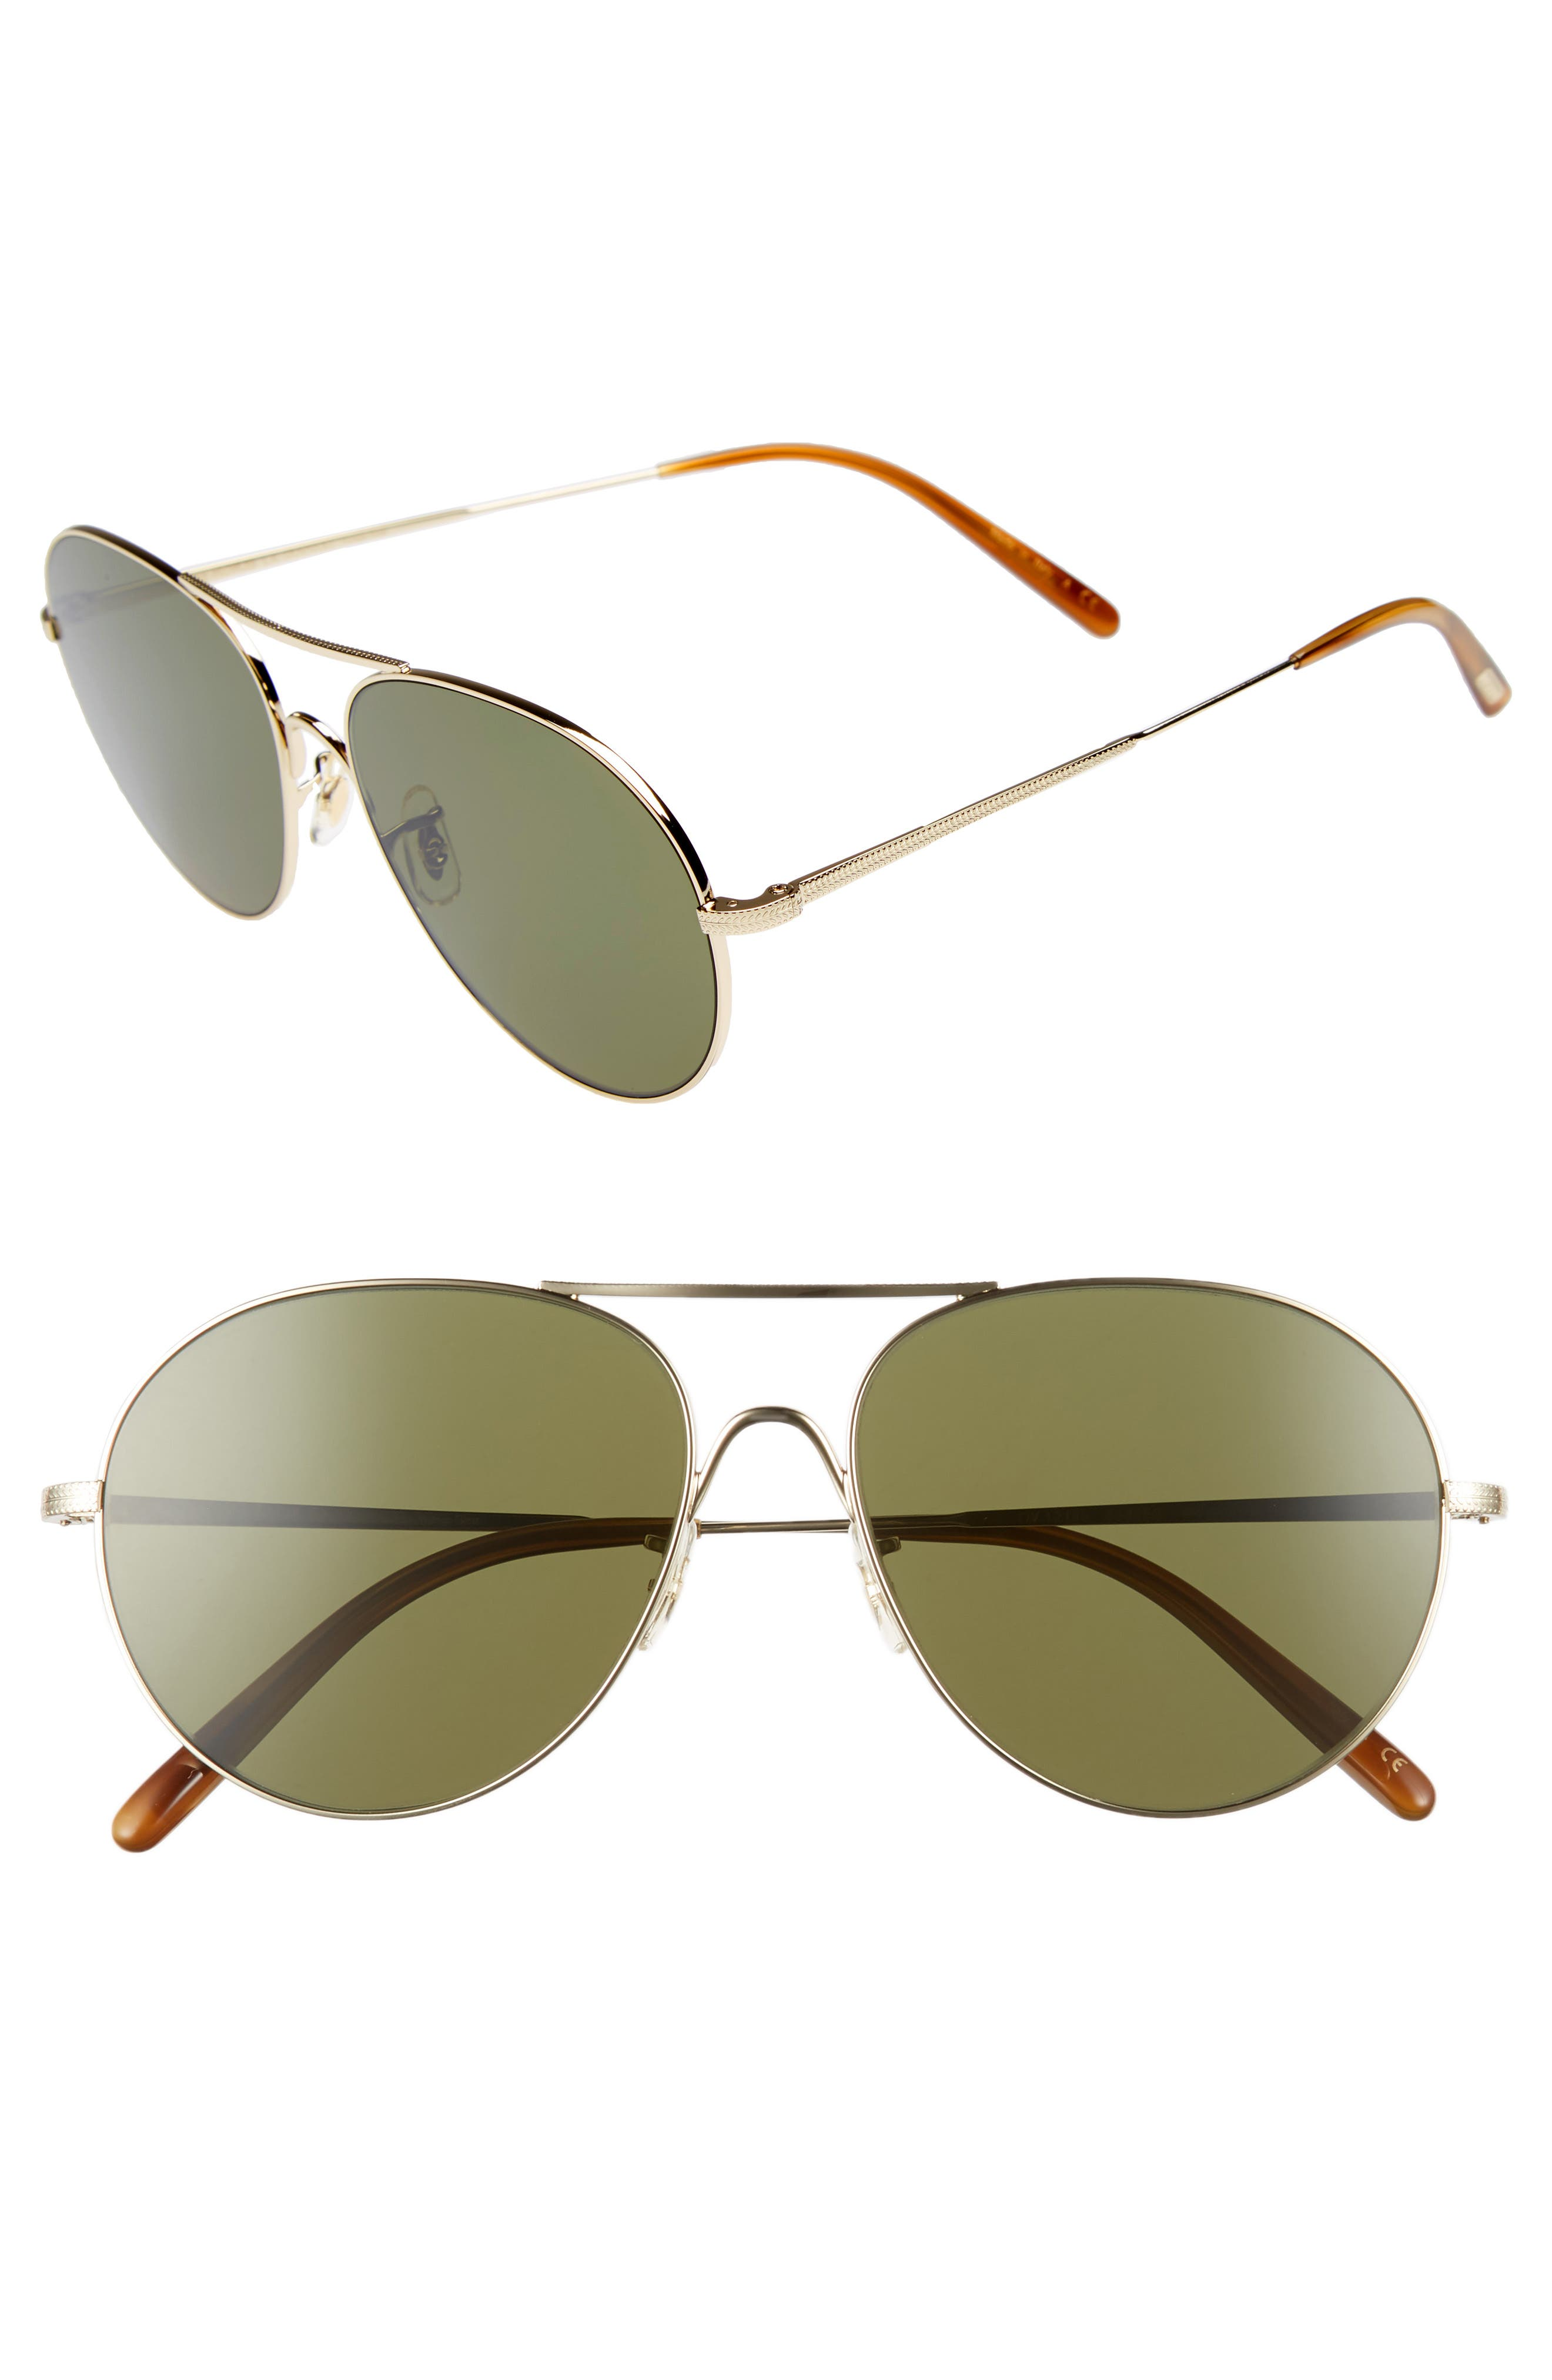 Rockmore 58mm Aviator Sunglasses,                             Main thumbnail 1, color,                             GOLD